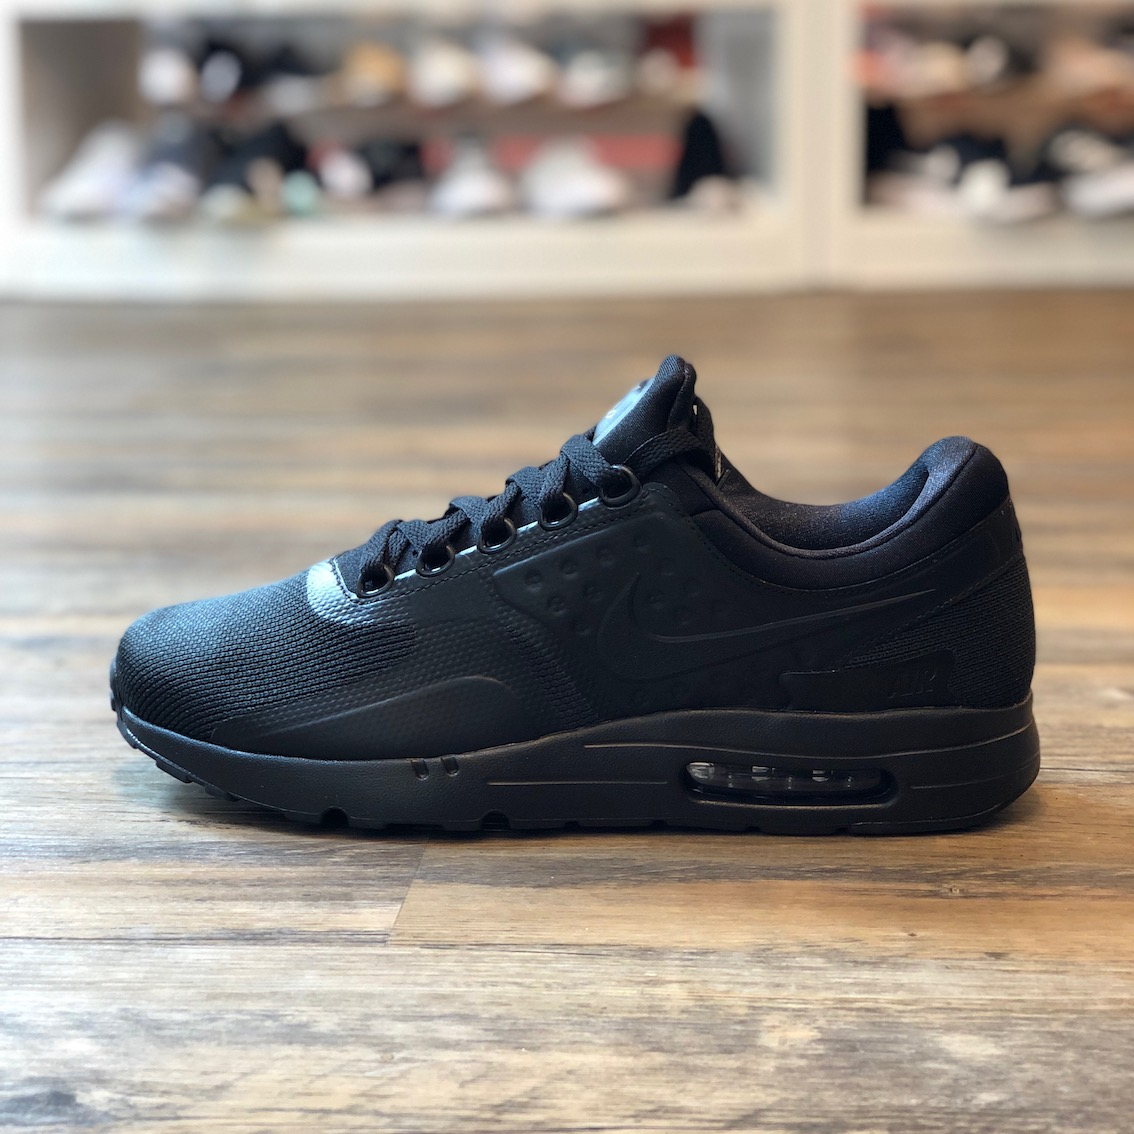 Details zu Nike Air Max Zero Essential Gr.43 Schuhe Sneaker Turn schwarz Neu 876070 006